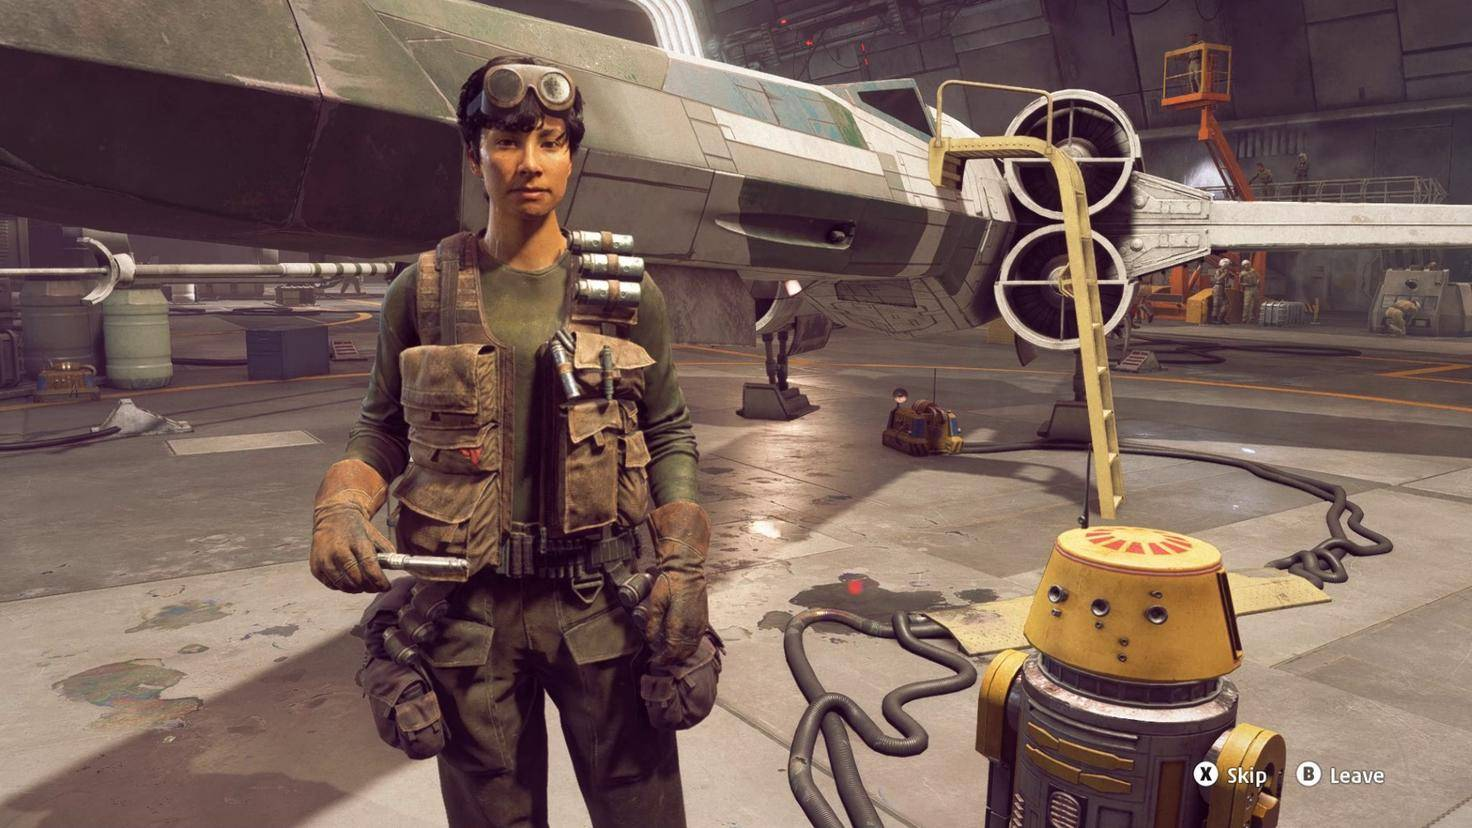 star-wars-squadrons-hangar-mechanic-rebels